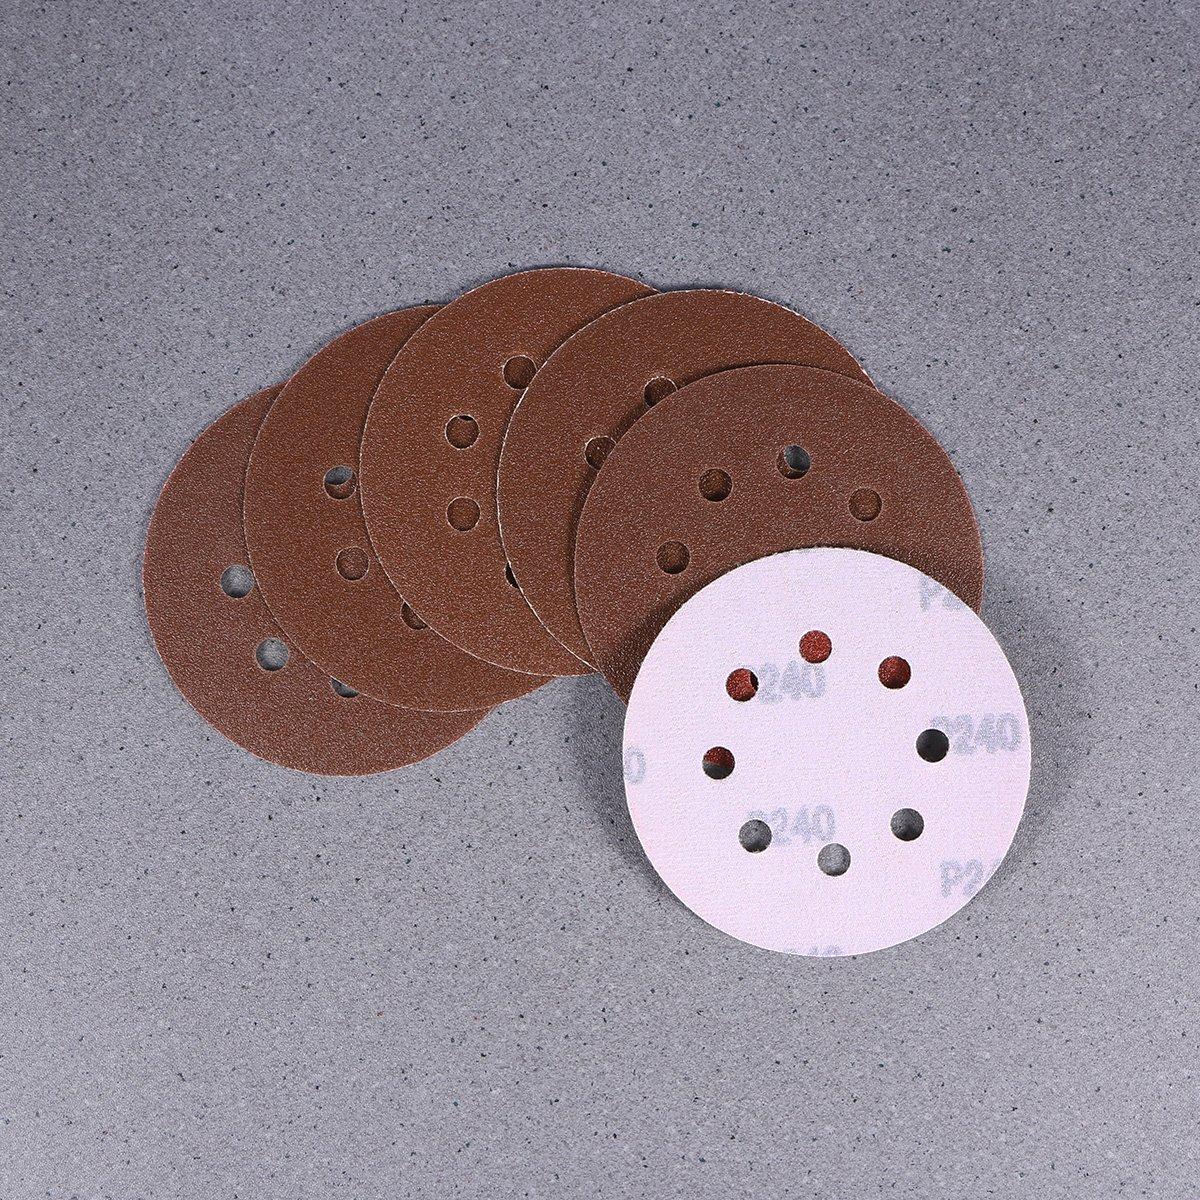 UEETEK 40pcs 8 Hole 5 Inch Sanding Discs round 60 80 120 210 Grit For Bosch PEX 220//300 Random Orbital Sander 125mm